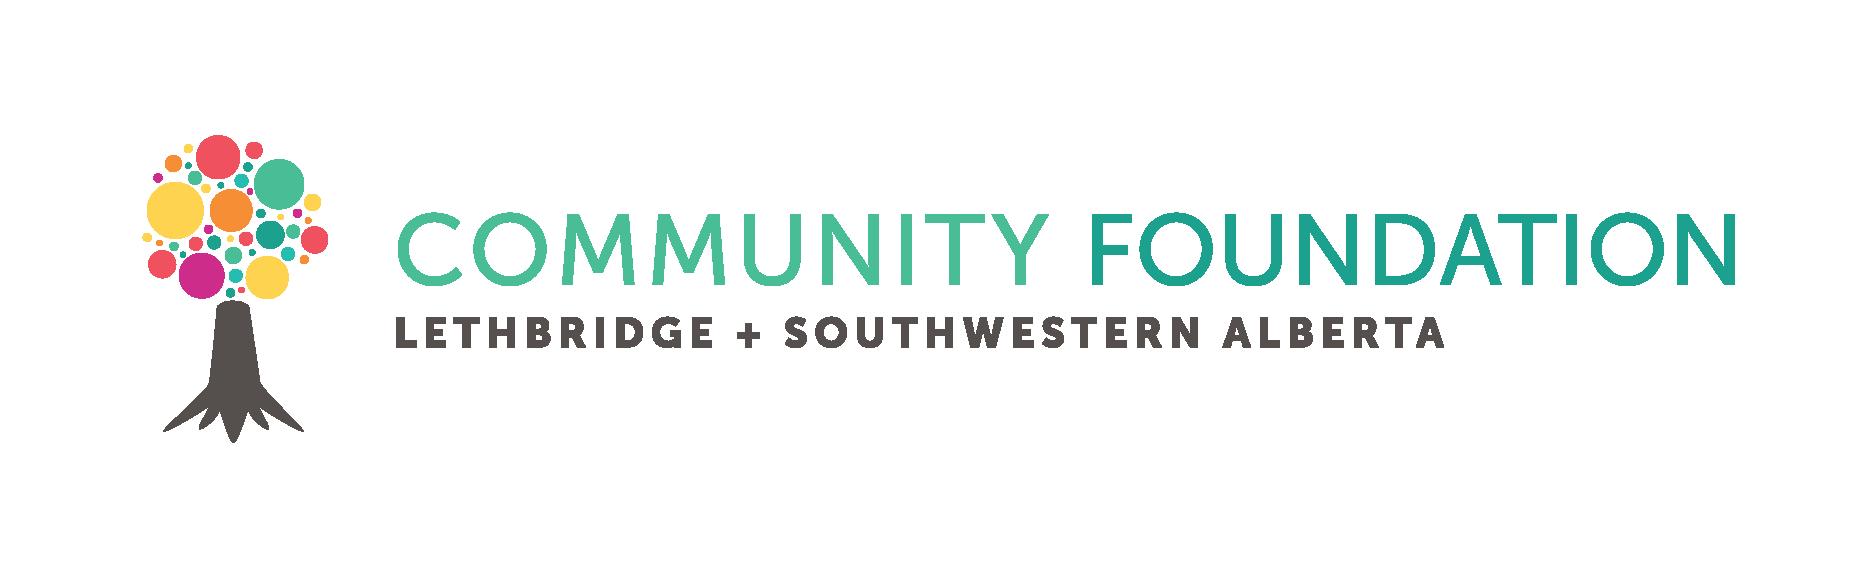 Community Foundation - Banner